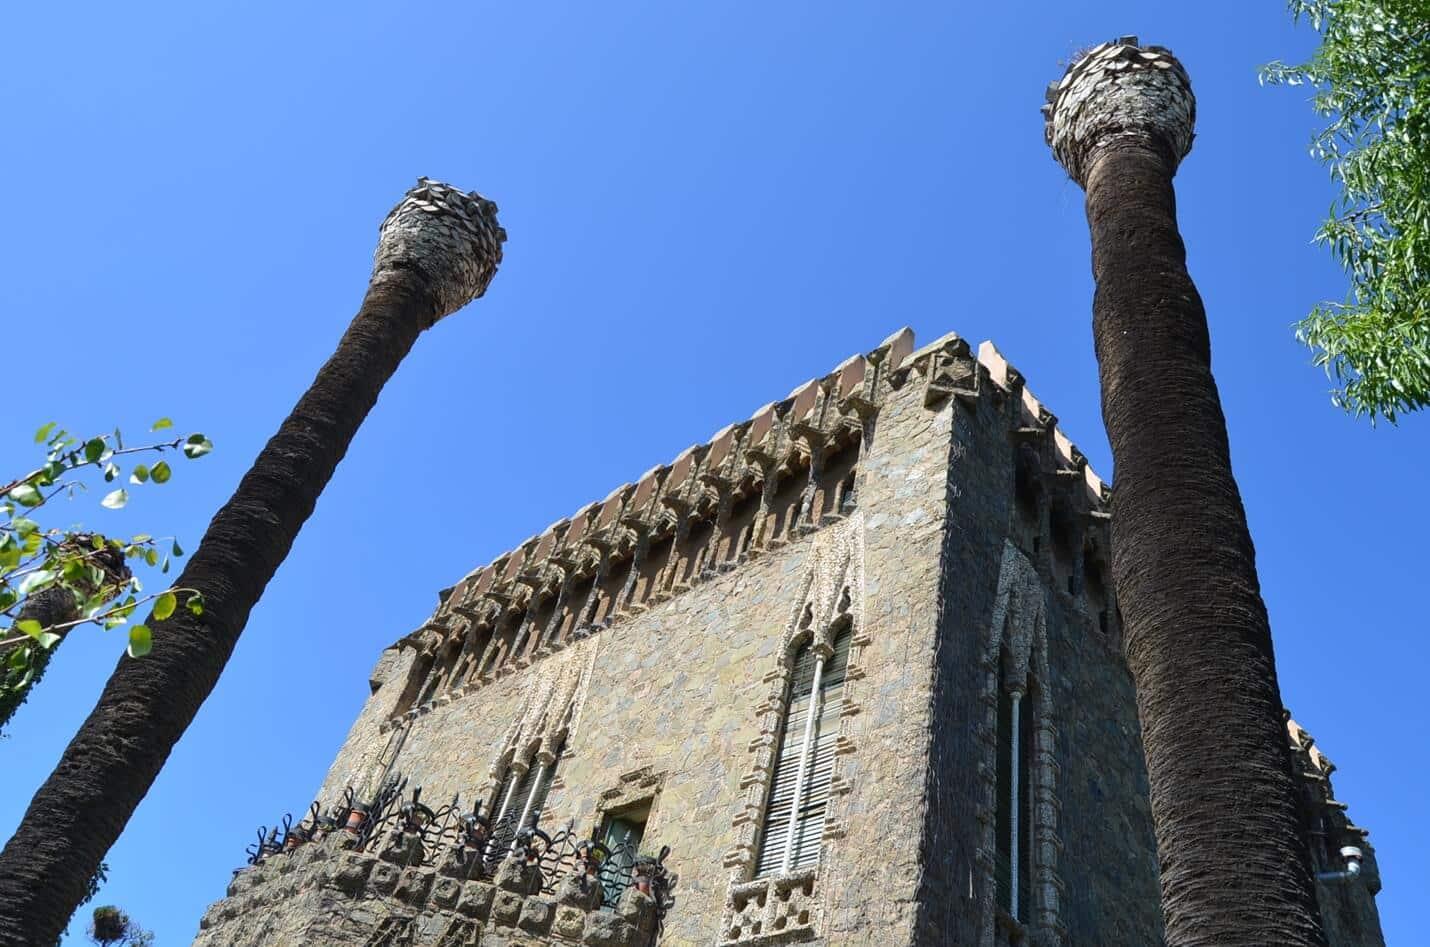 Torre de Bellesguard - Top - Alba - stock.adobe.com